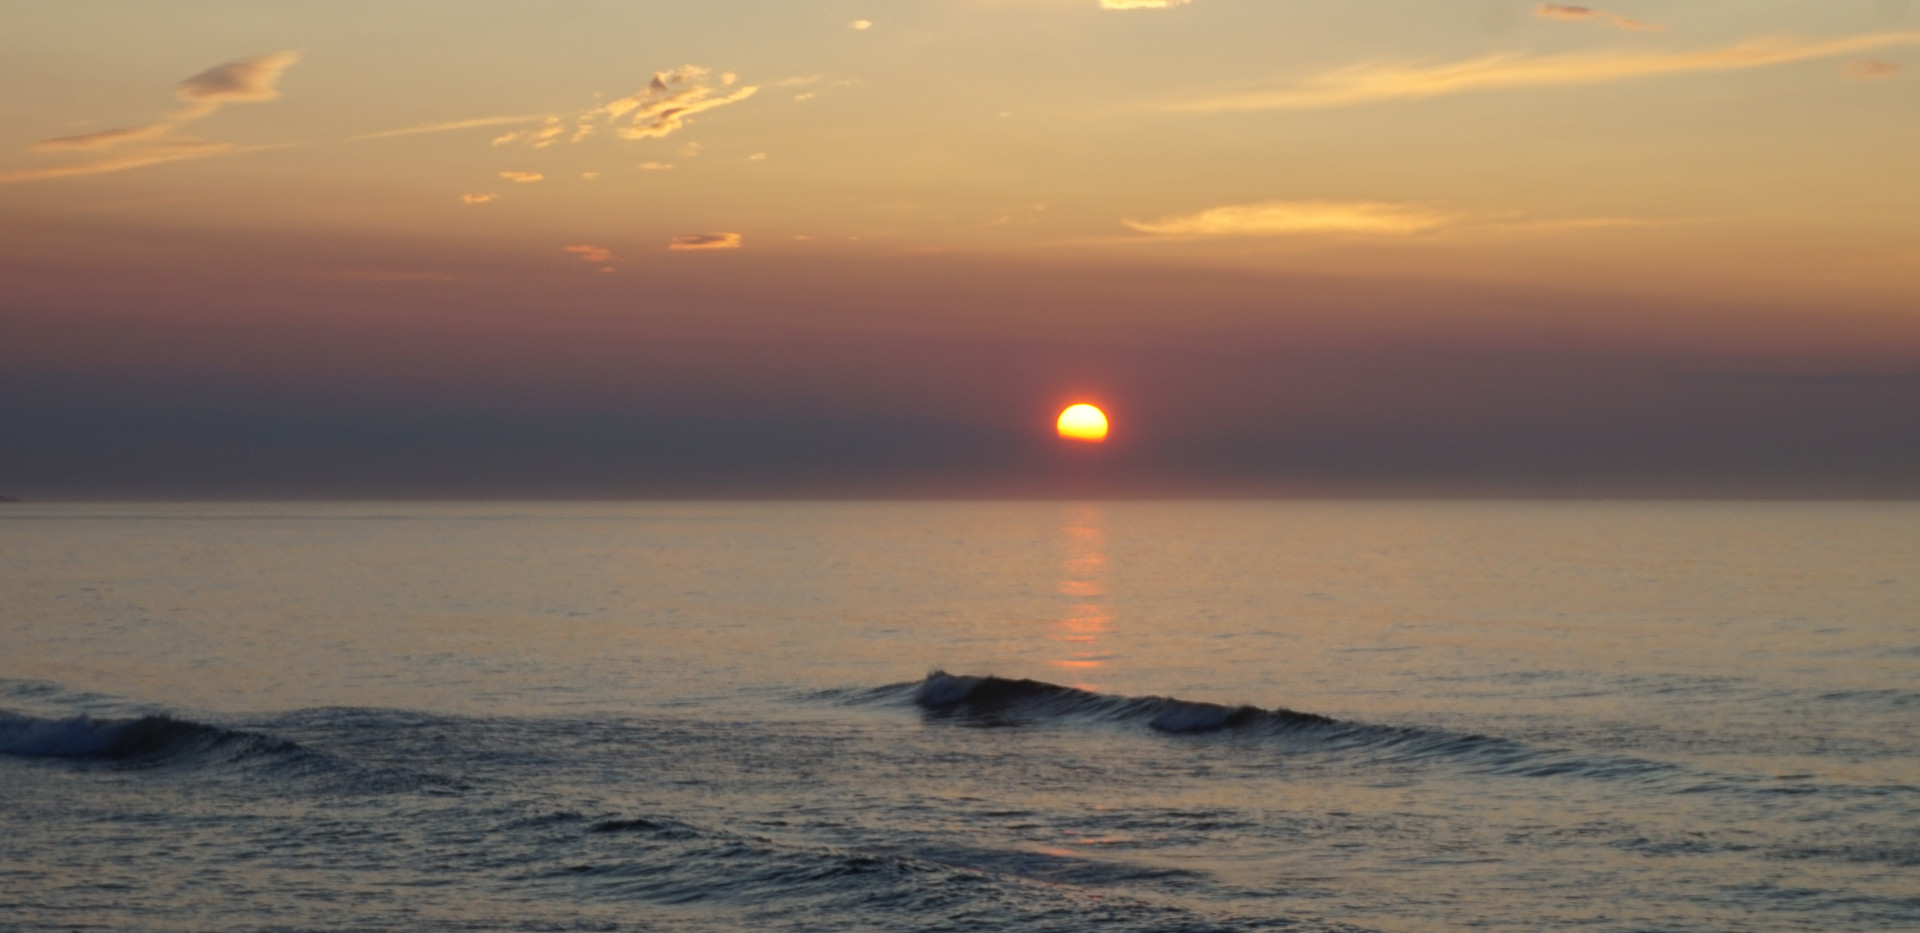 Sunset Ile du Prince Edward.JPG